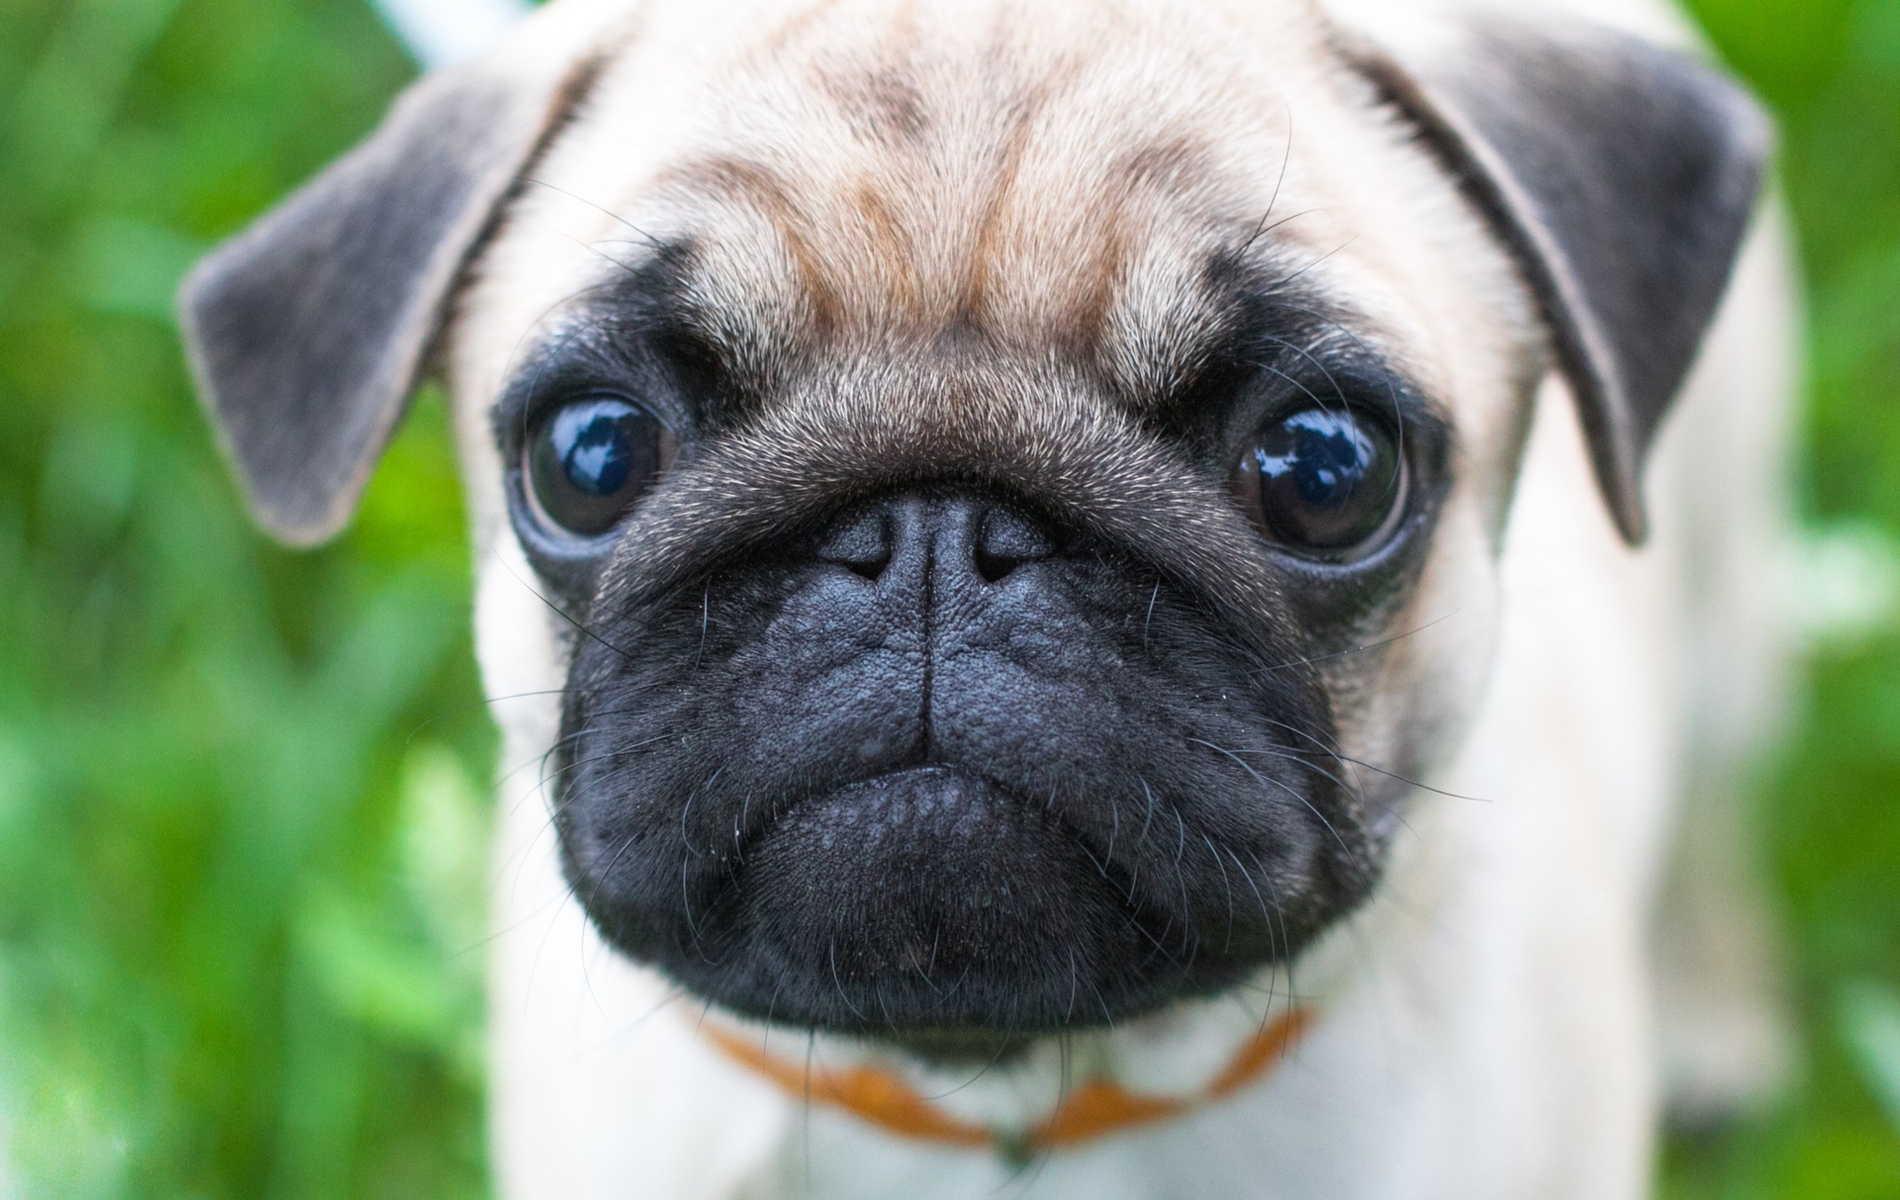 Pug Dog Images Download Forever Wallpapers